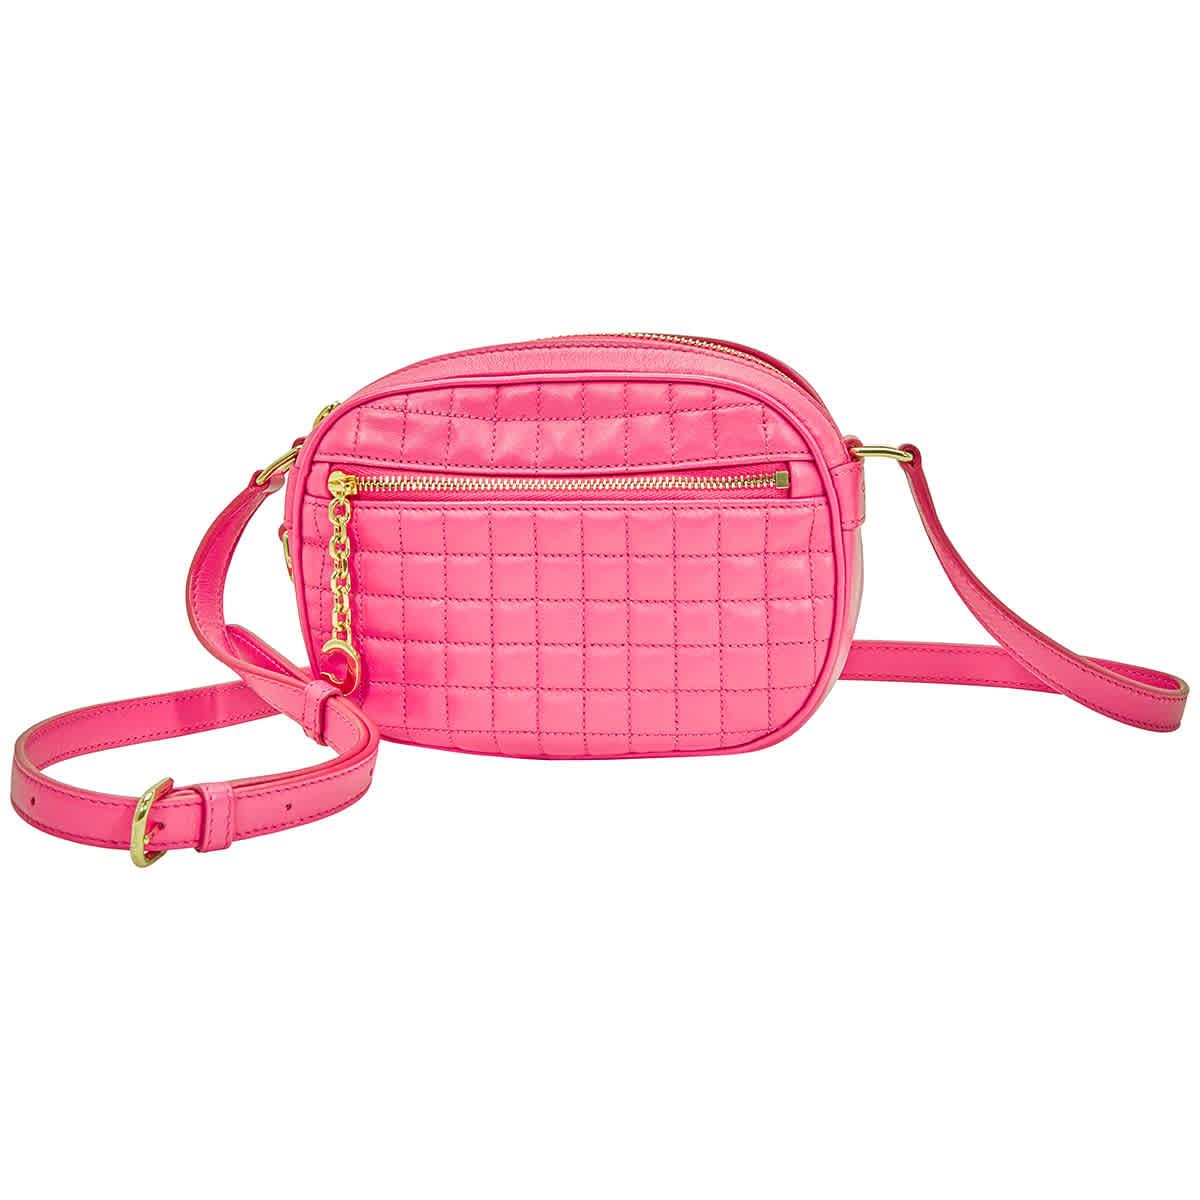 Celine Céline Women's Fuchsia Leather Shoulder Bag In Gold Tone,pink